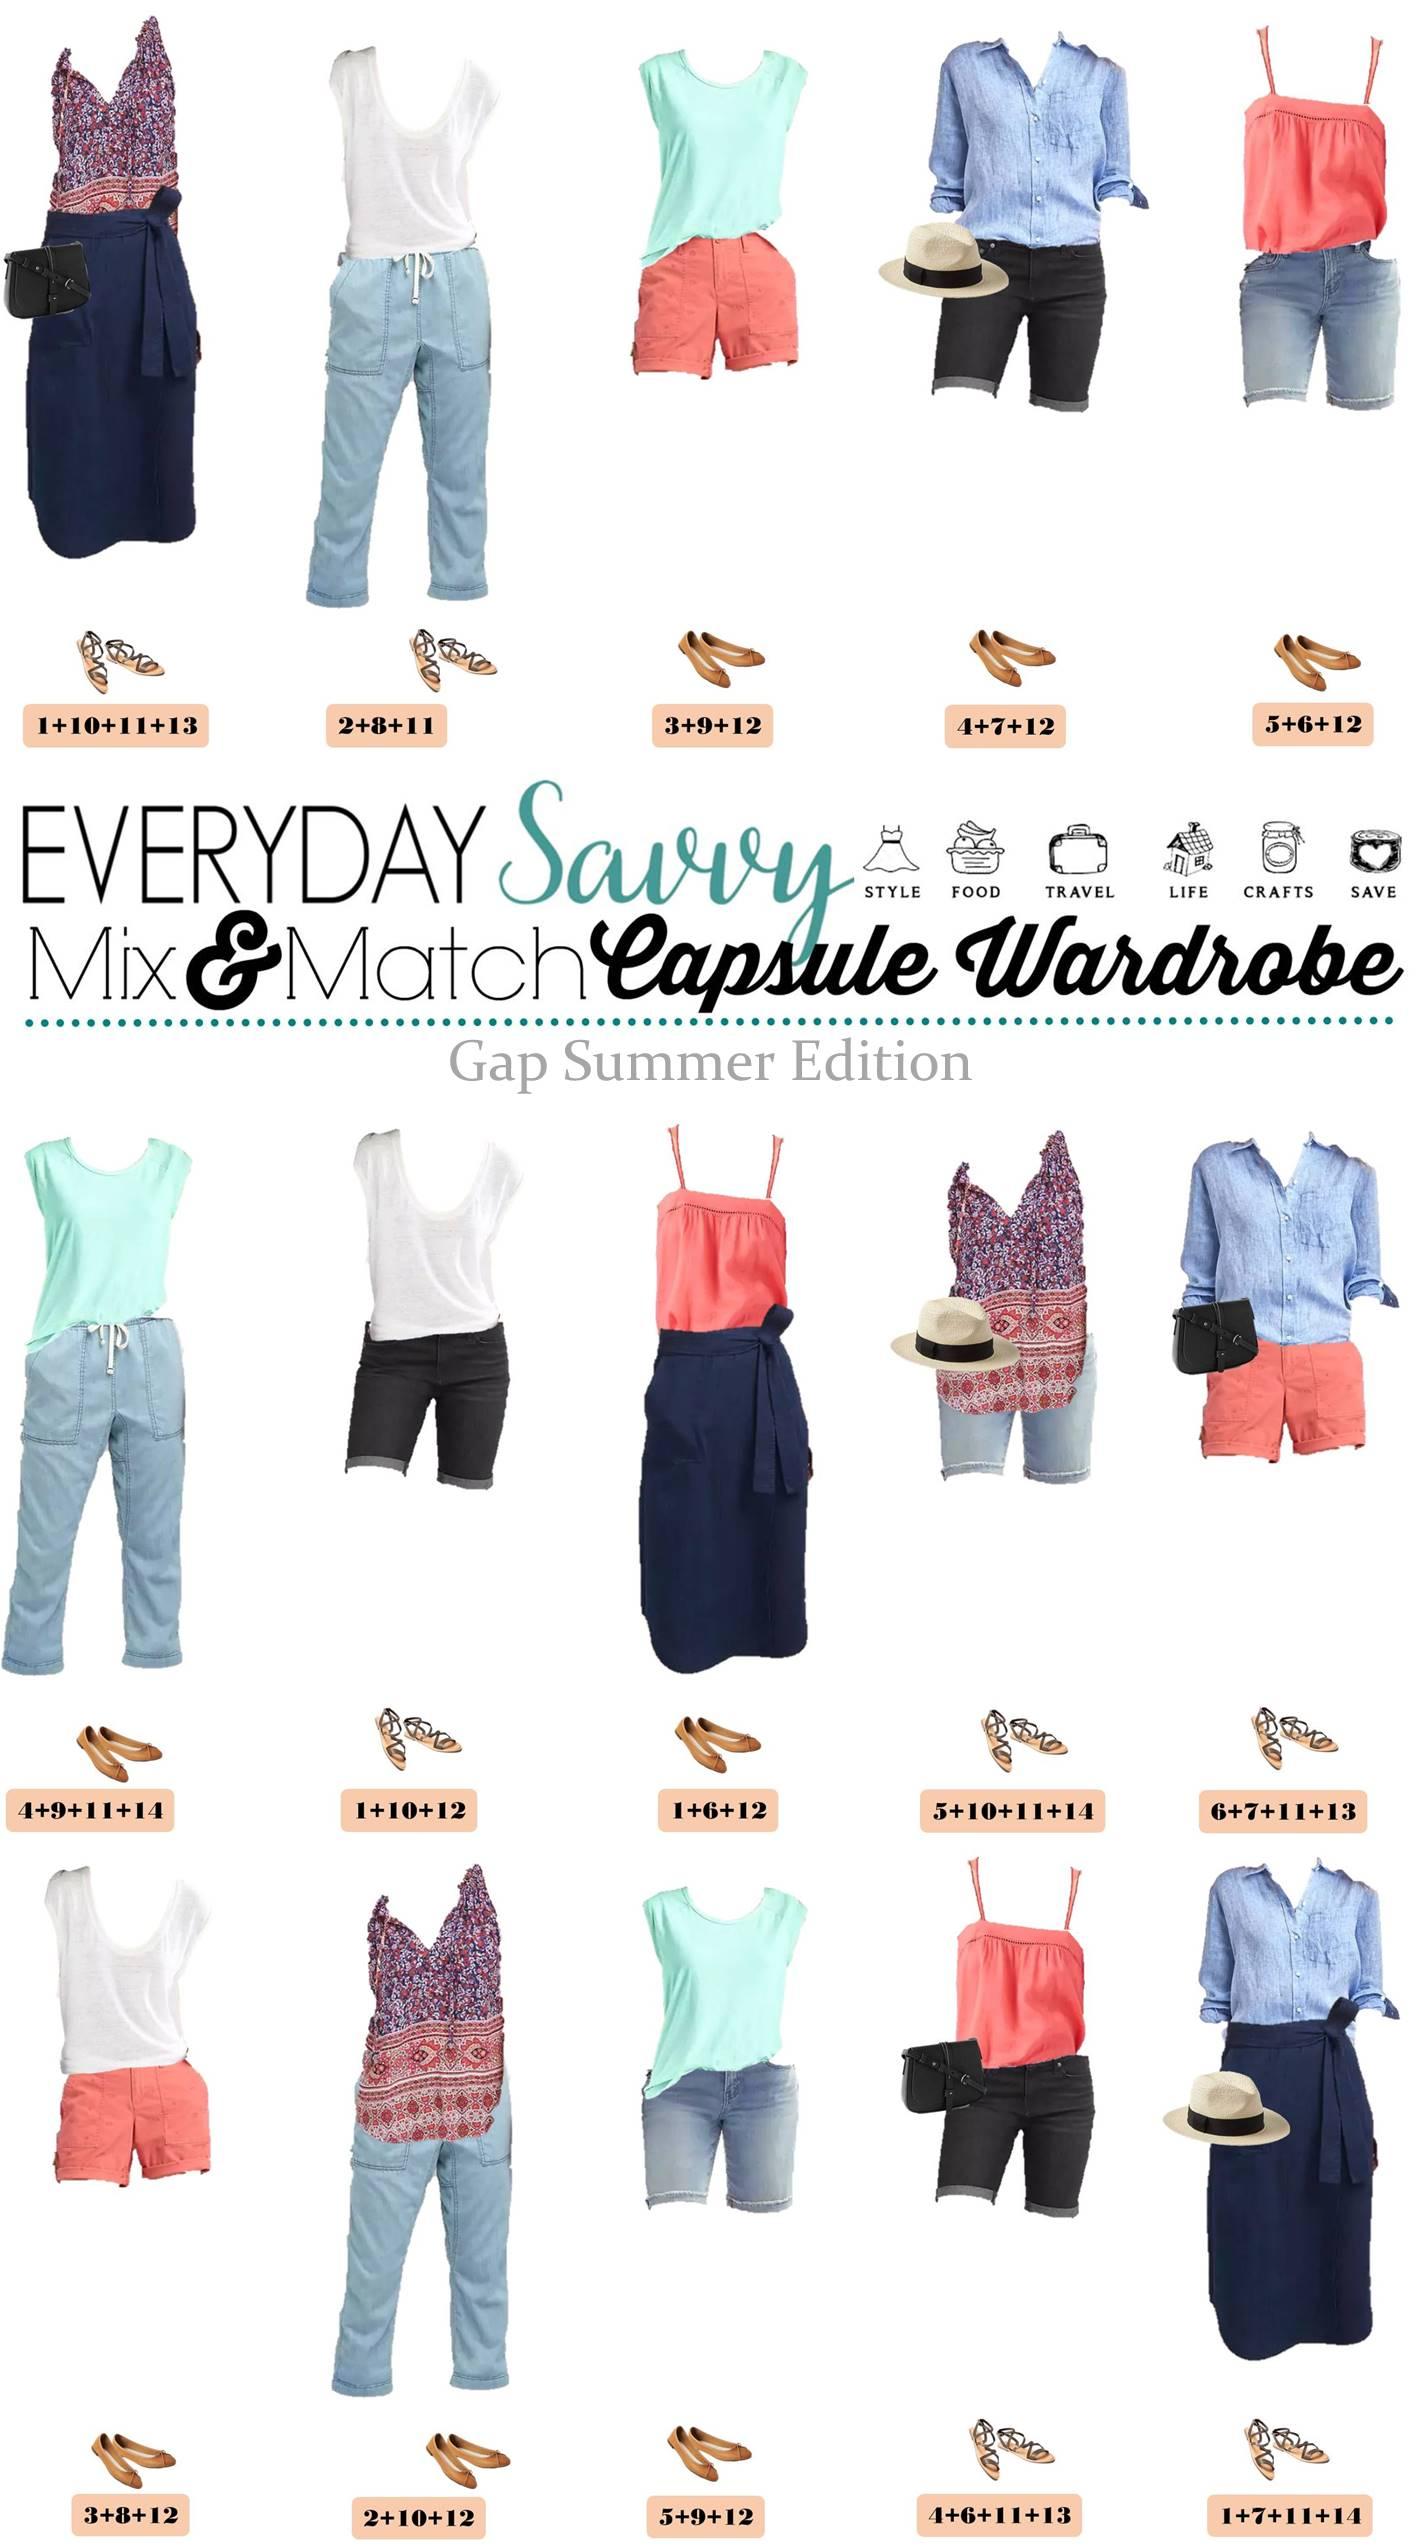 Gap Summer Capsule Wardrobe